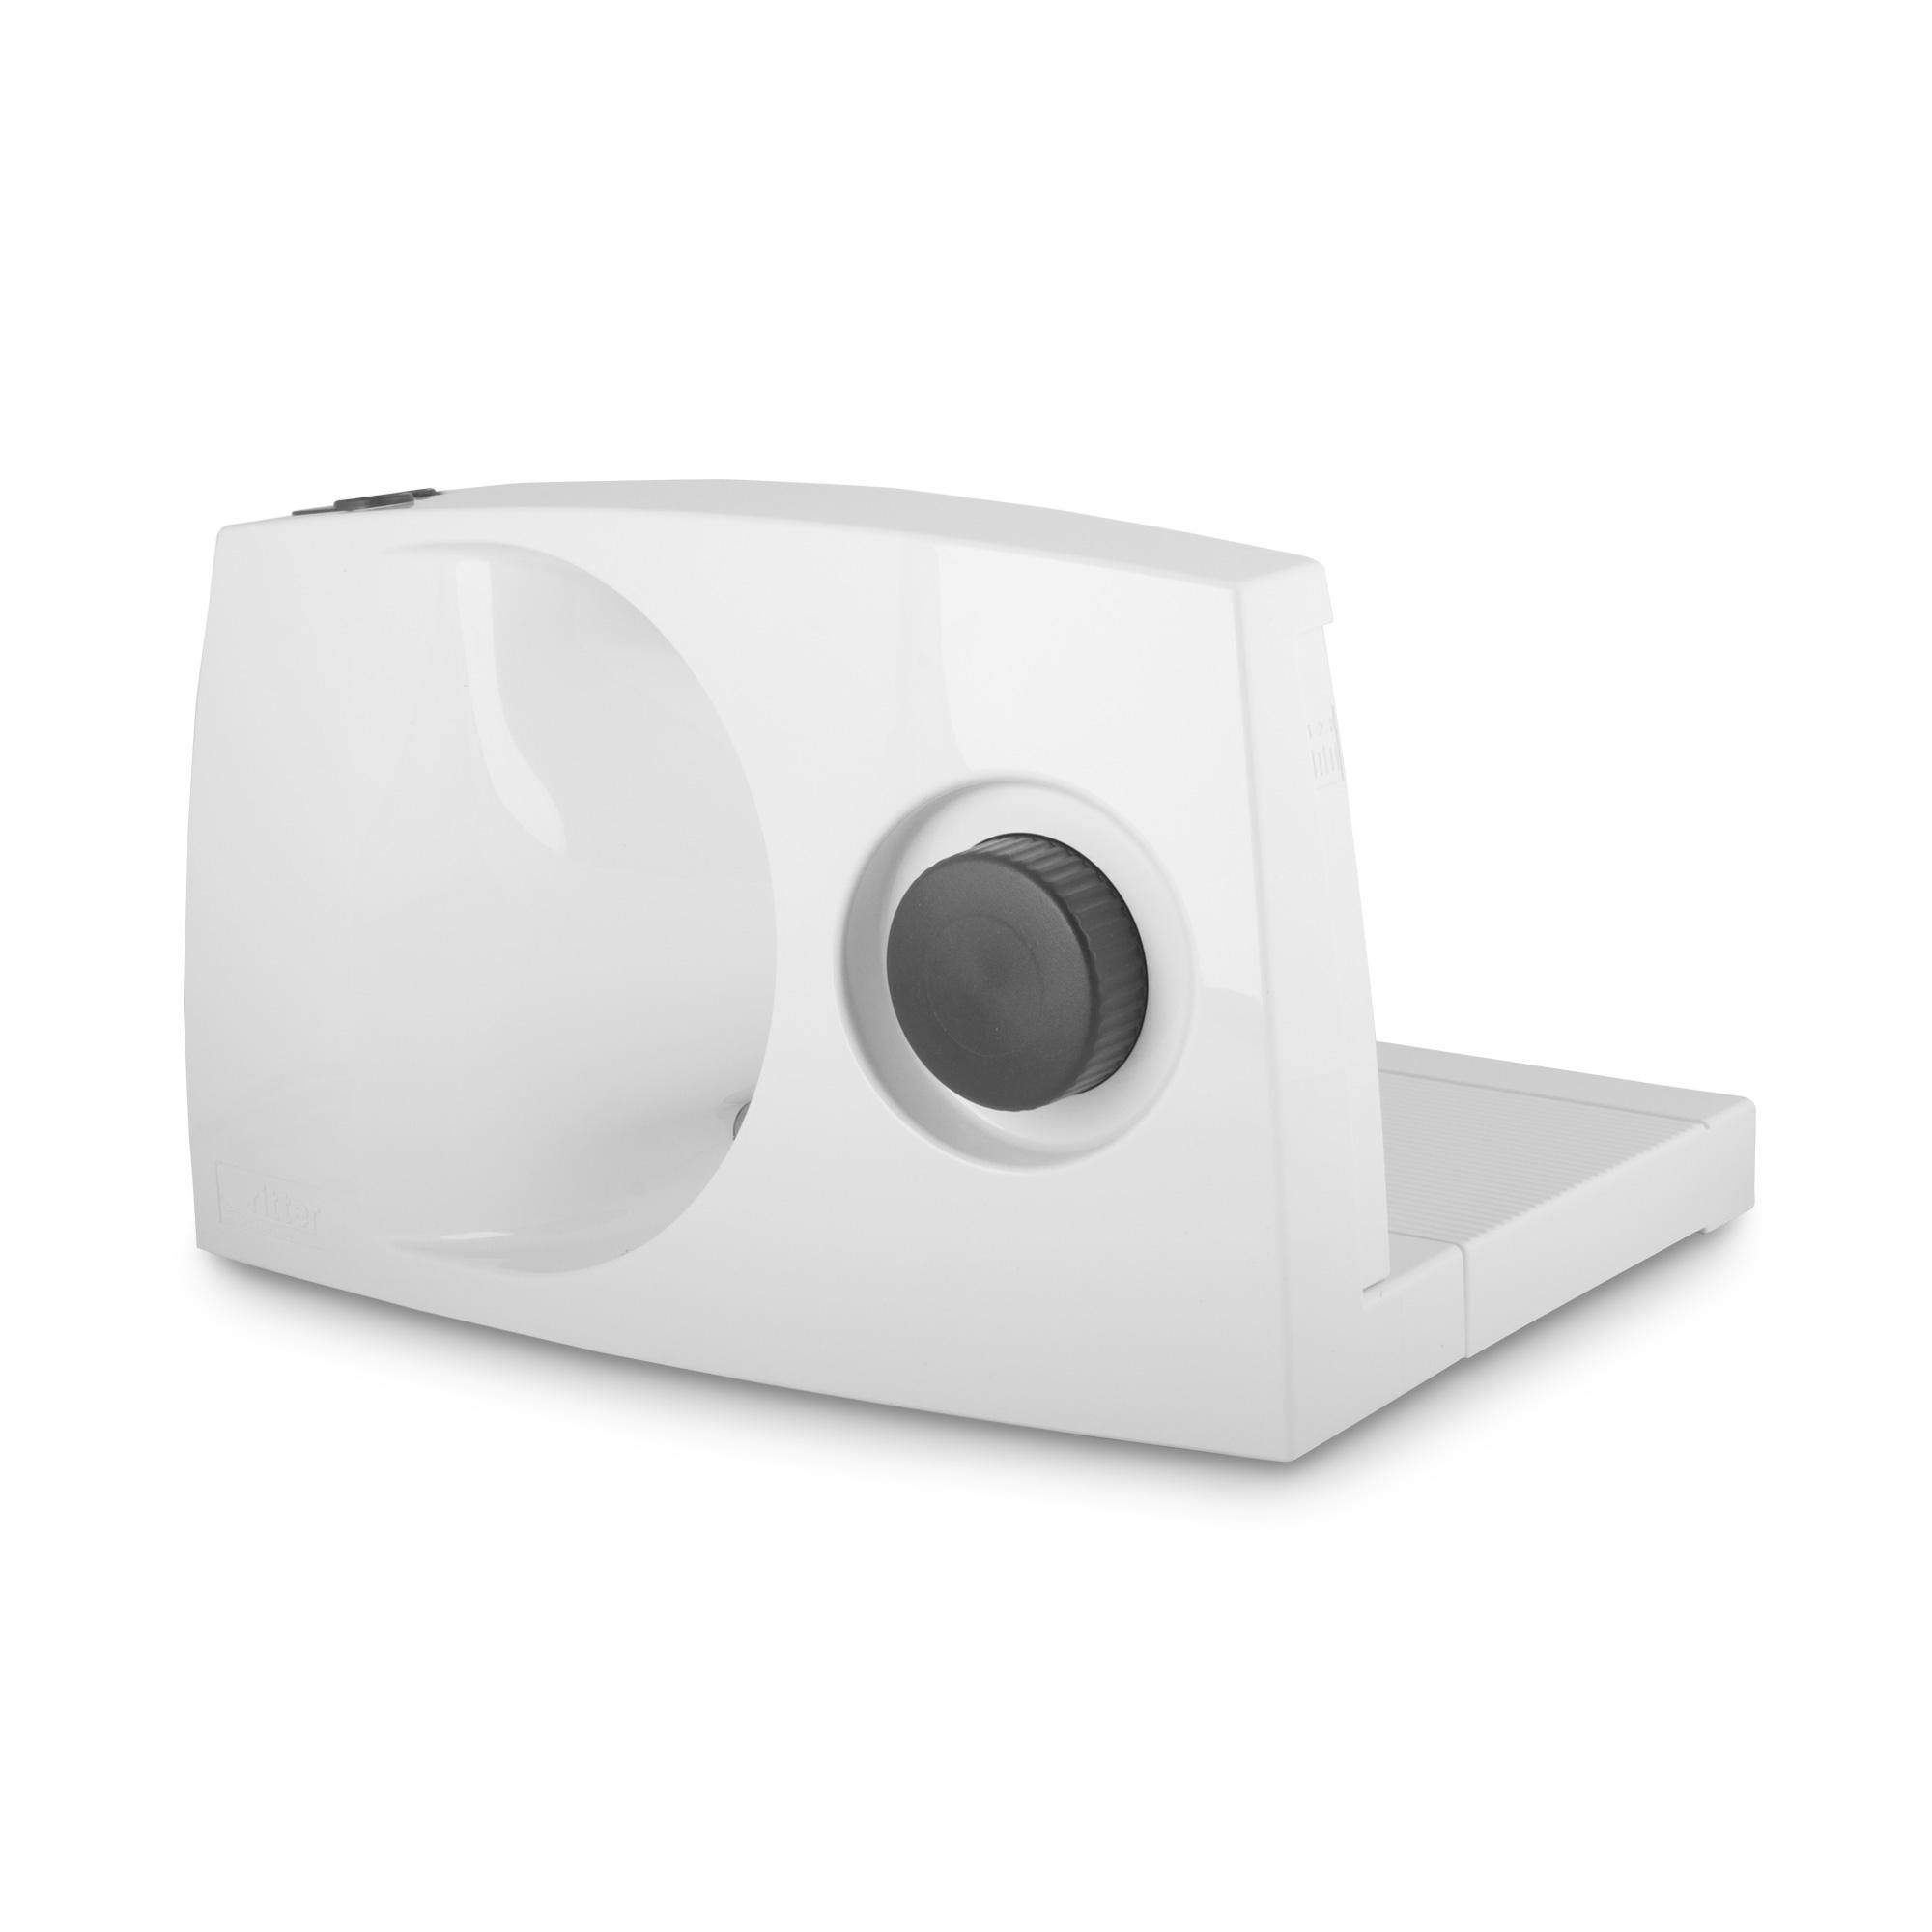 allesschneider markant 05 economy elektrisch klappbar ritter. Black Bedroom Furniture Sets. Home Design Ideas